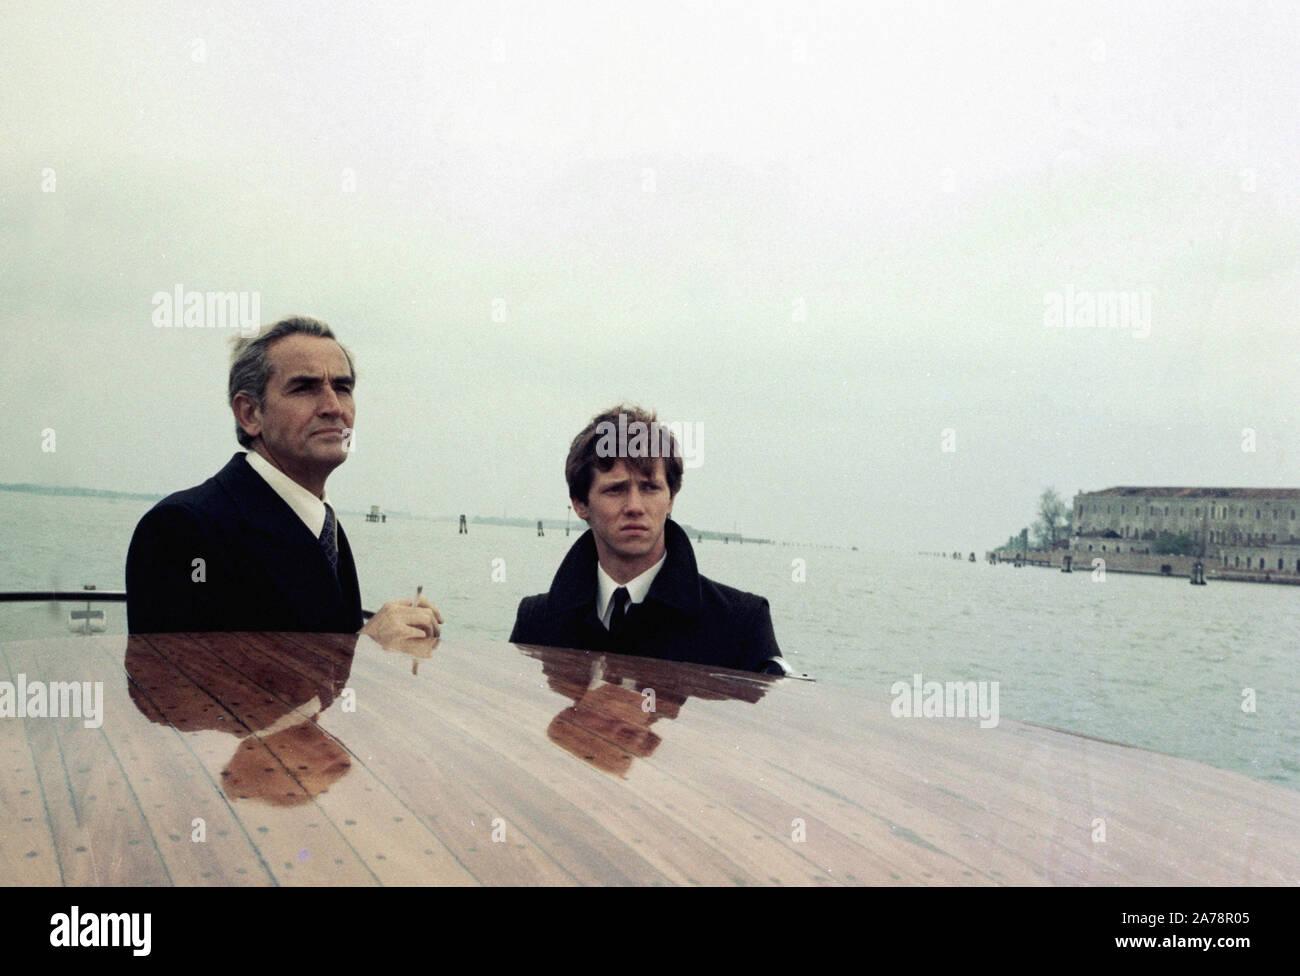 Anima Persa 1977 les ames perdues anima persa 1977 de dino risi vittorio